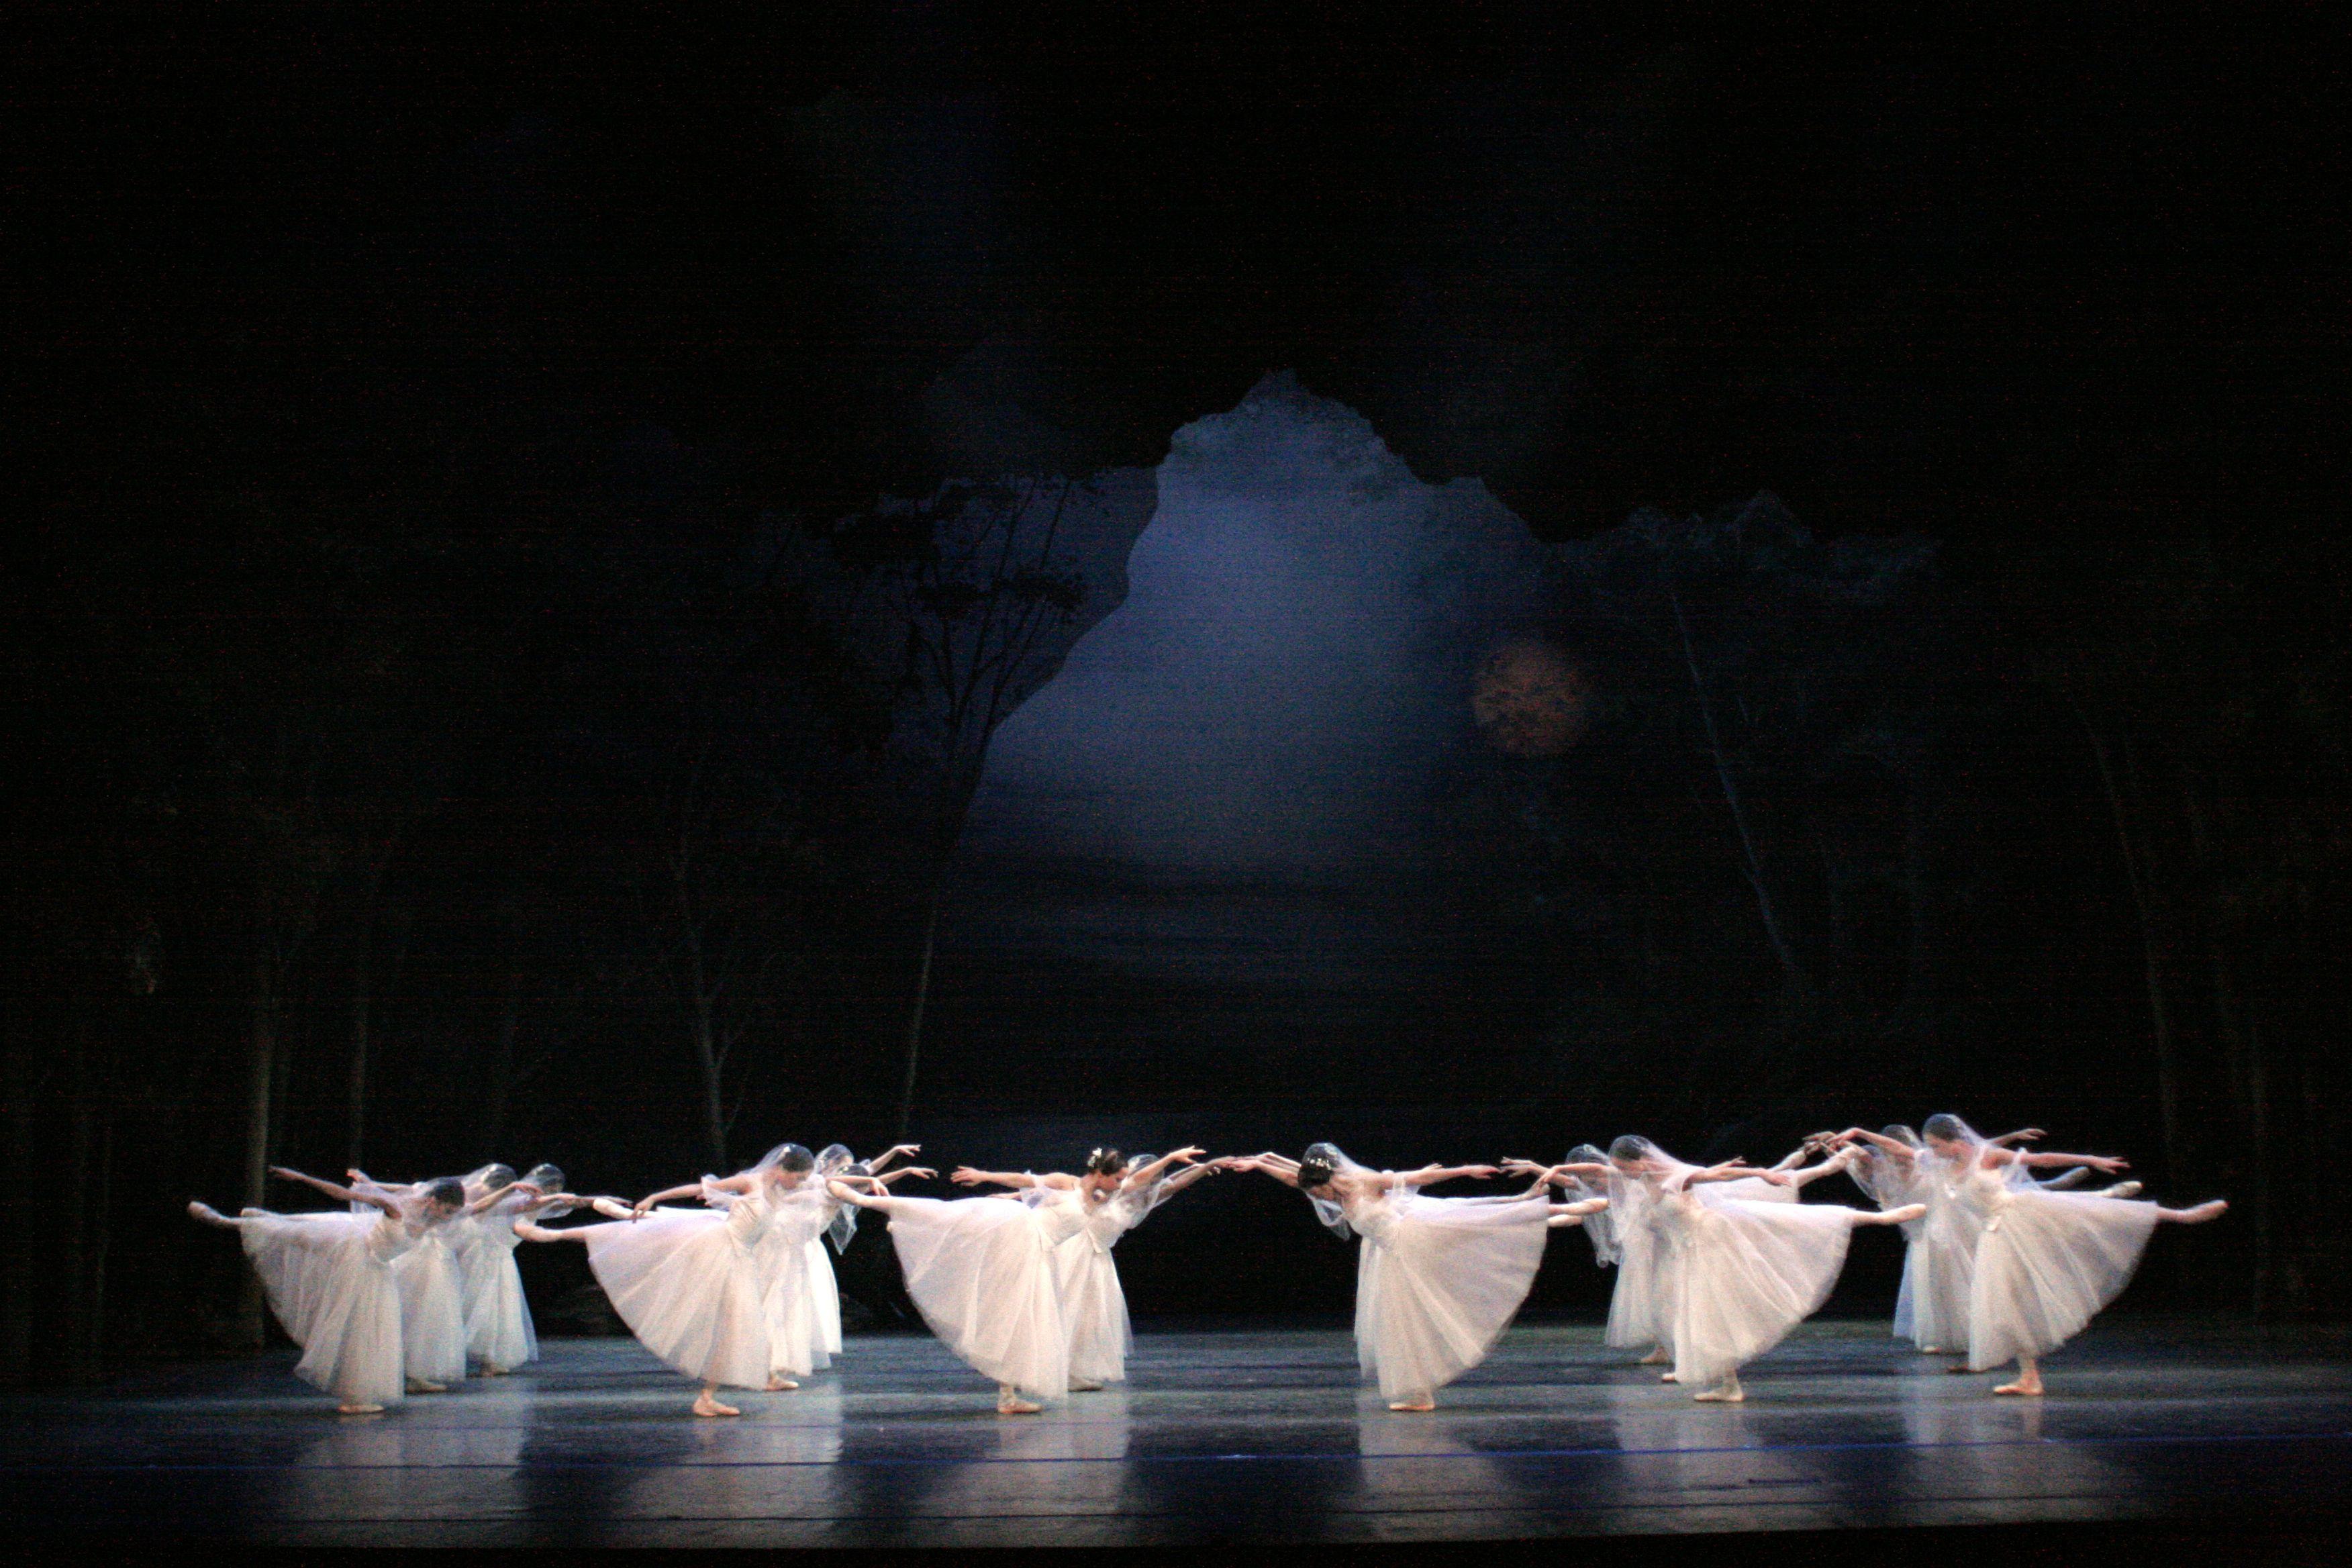 giselle ballet - Google Search